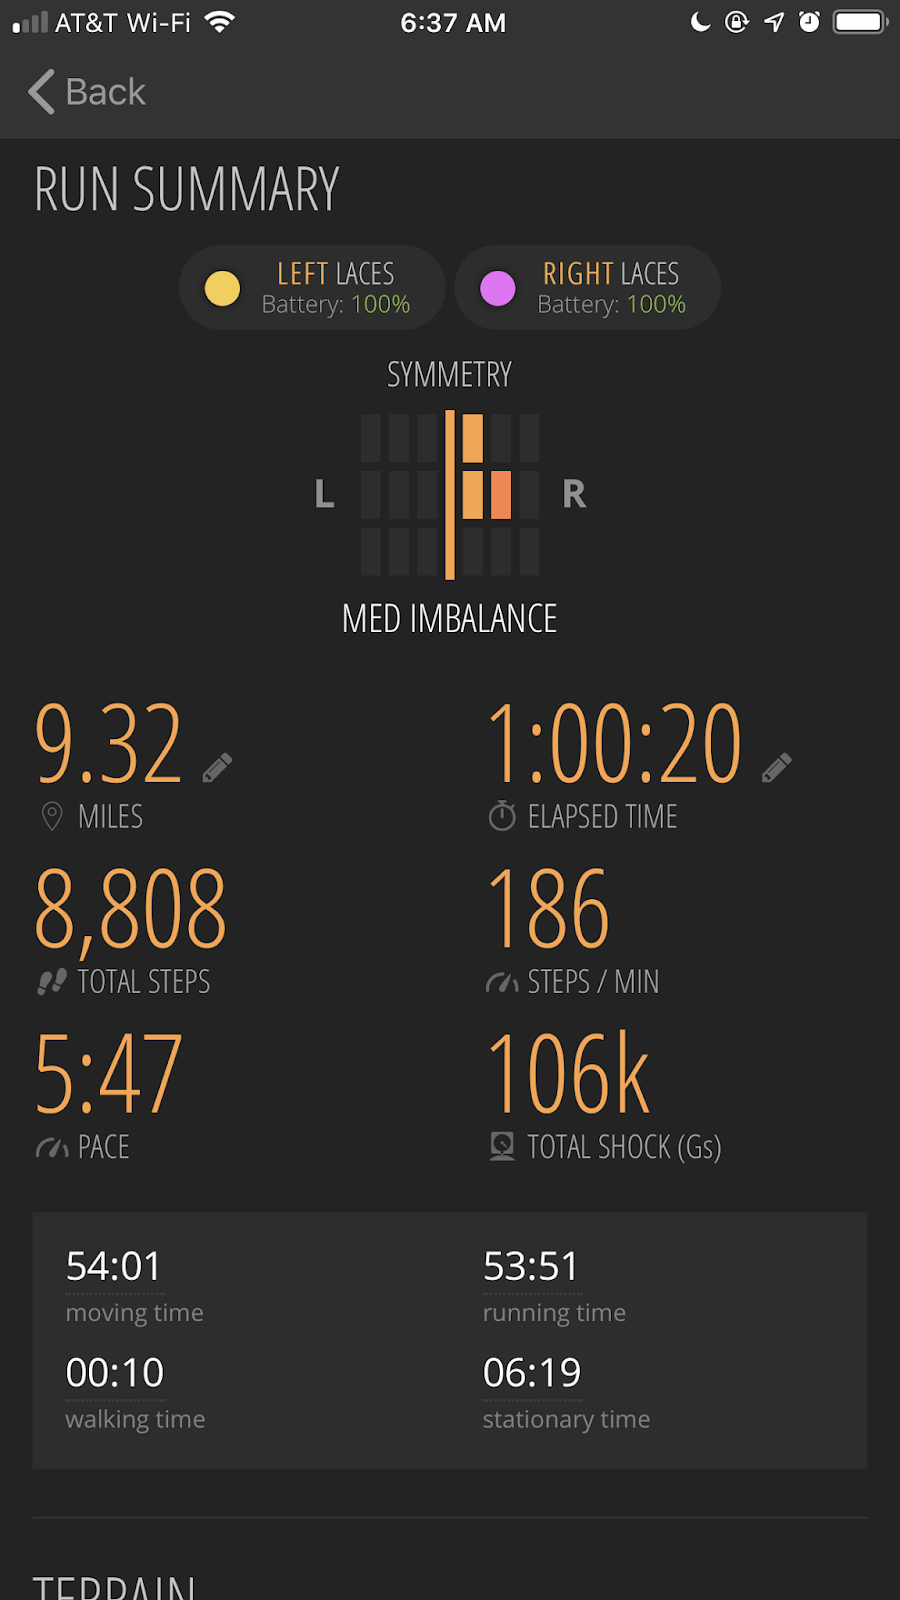 Road Trail Run: Stryd versus RunScribe Plus: Can Data Make You Faster?